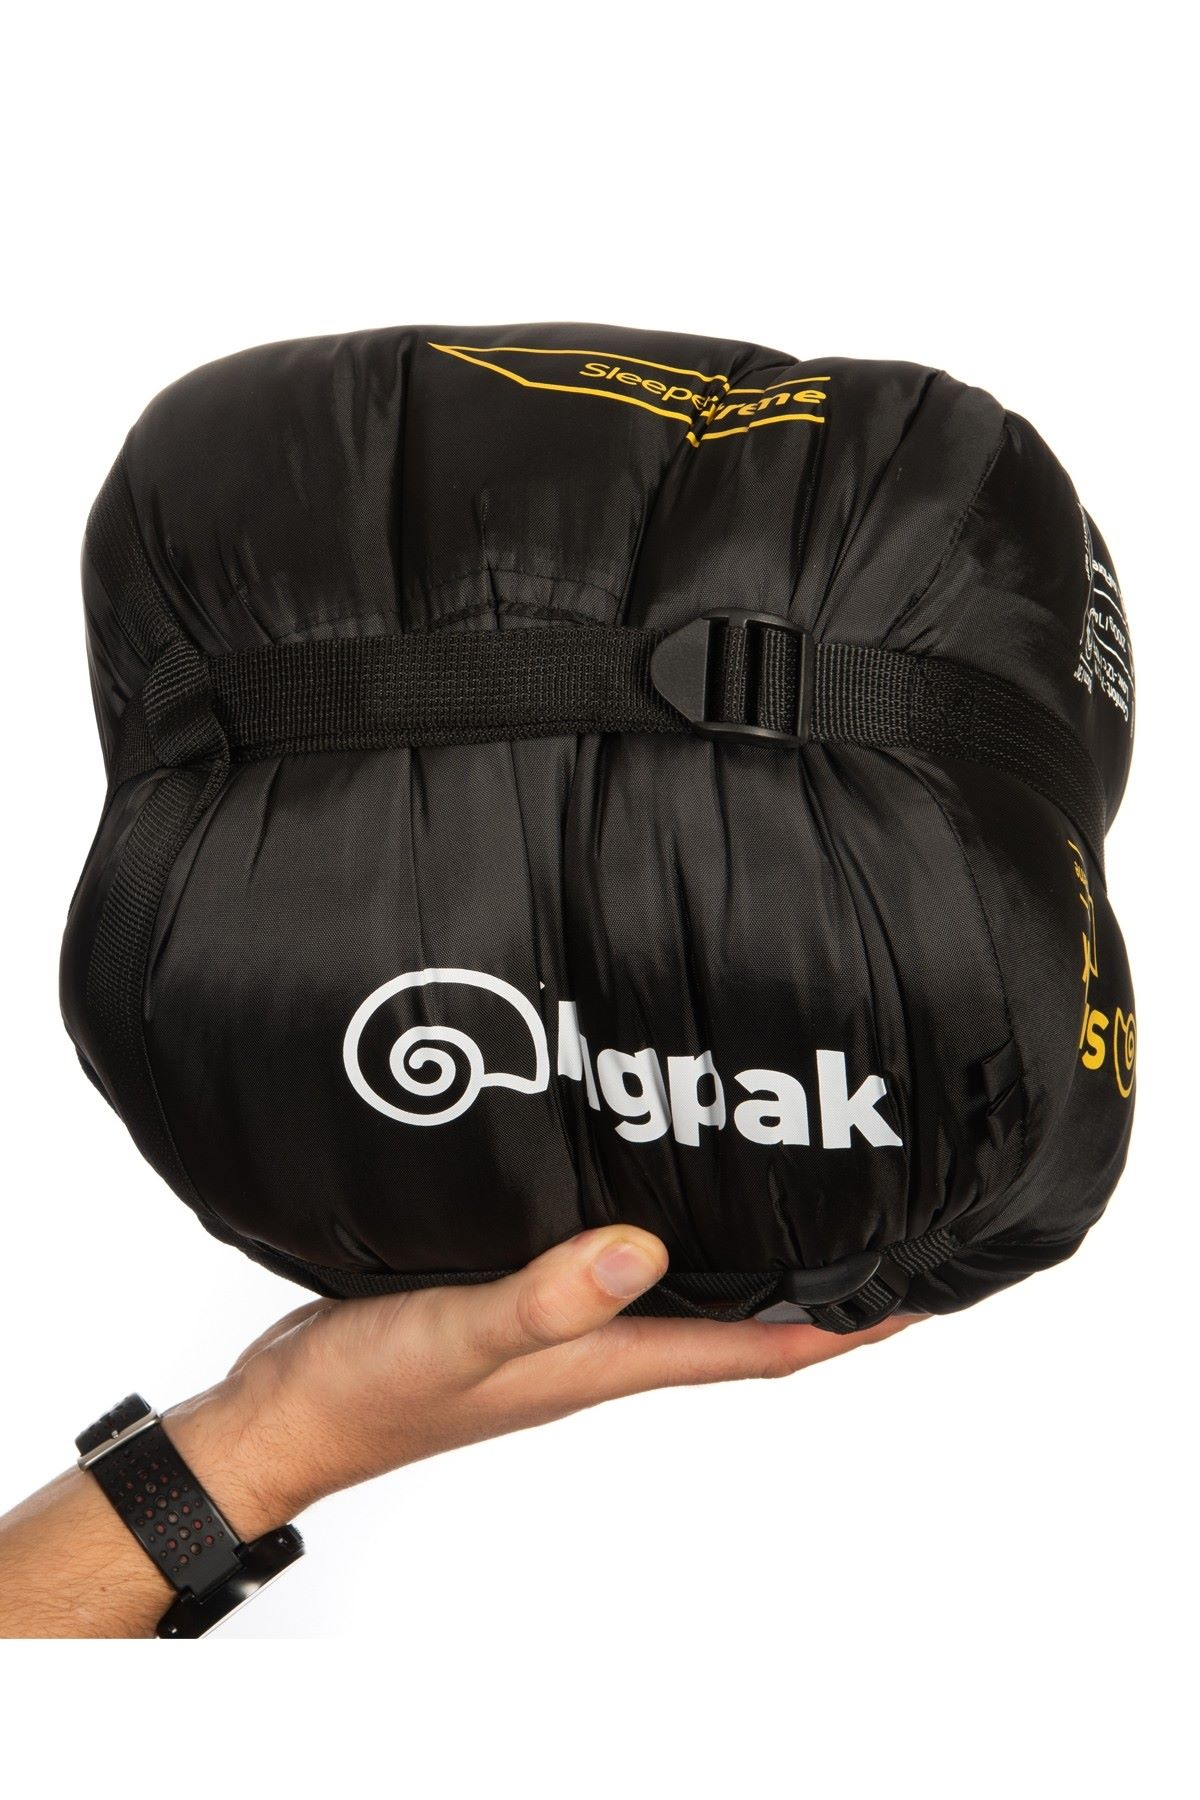 Snugpak Sleeper Extreme (Basecamp) Sleeping Bag - Black